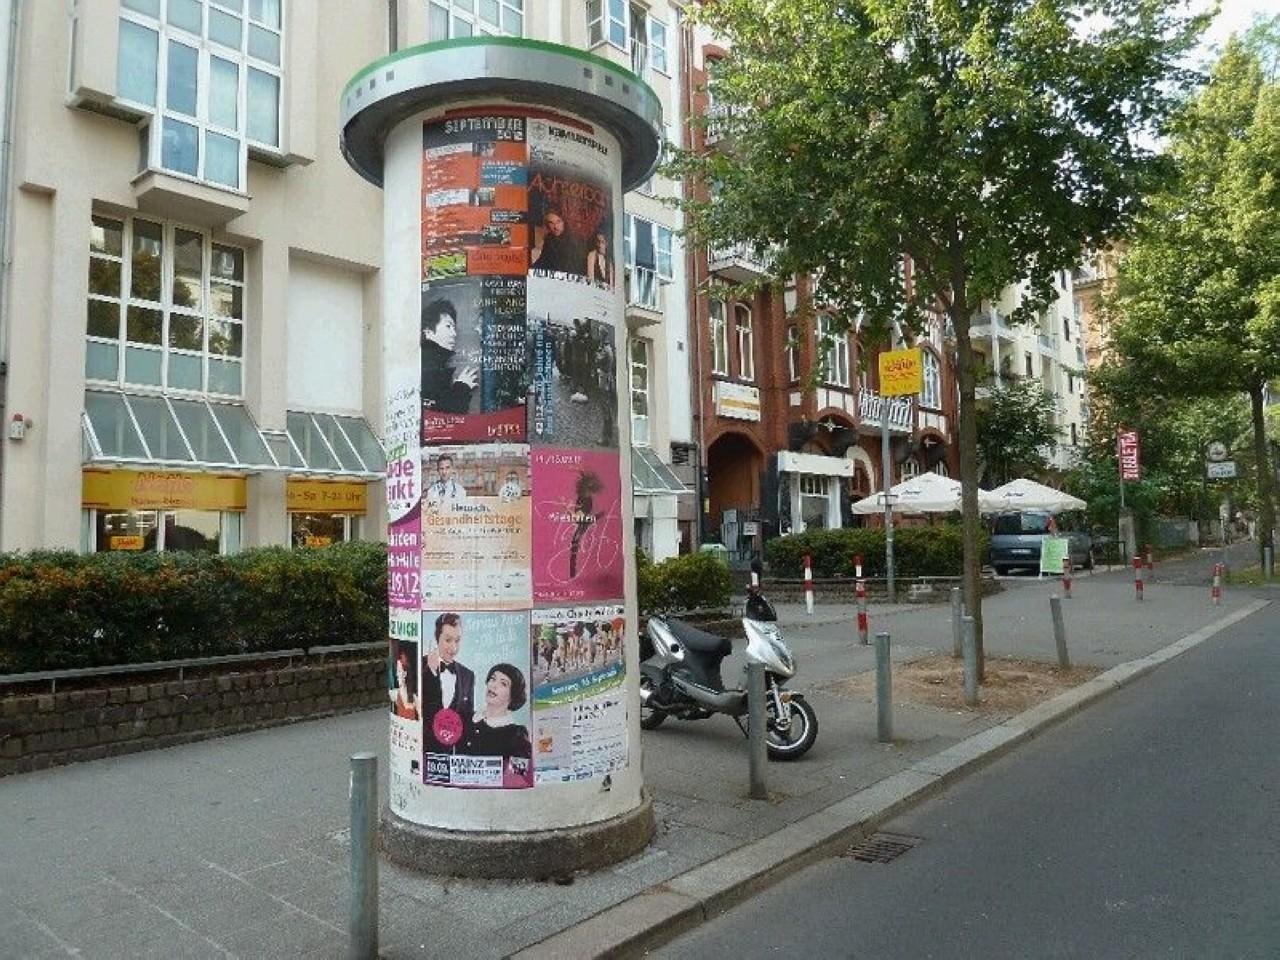 1 2 3 Plakatdekulturwerbung Kultur Werbung In 65183 Wiesbaden